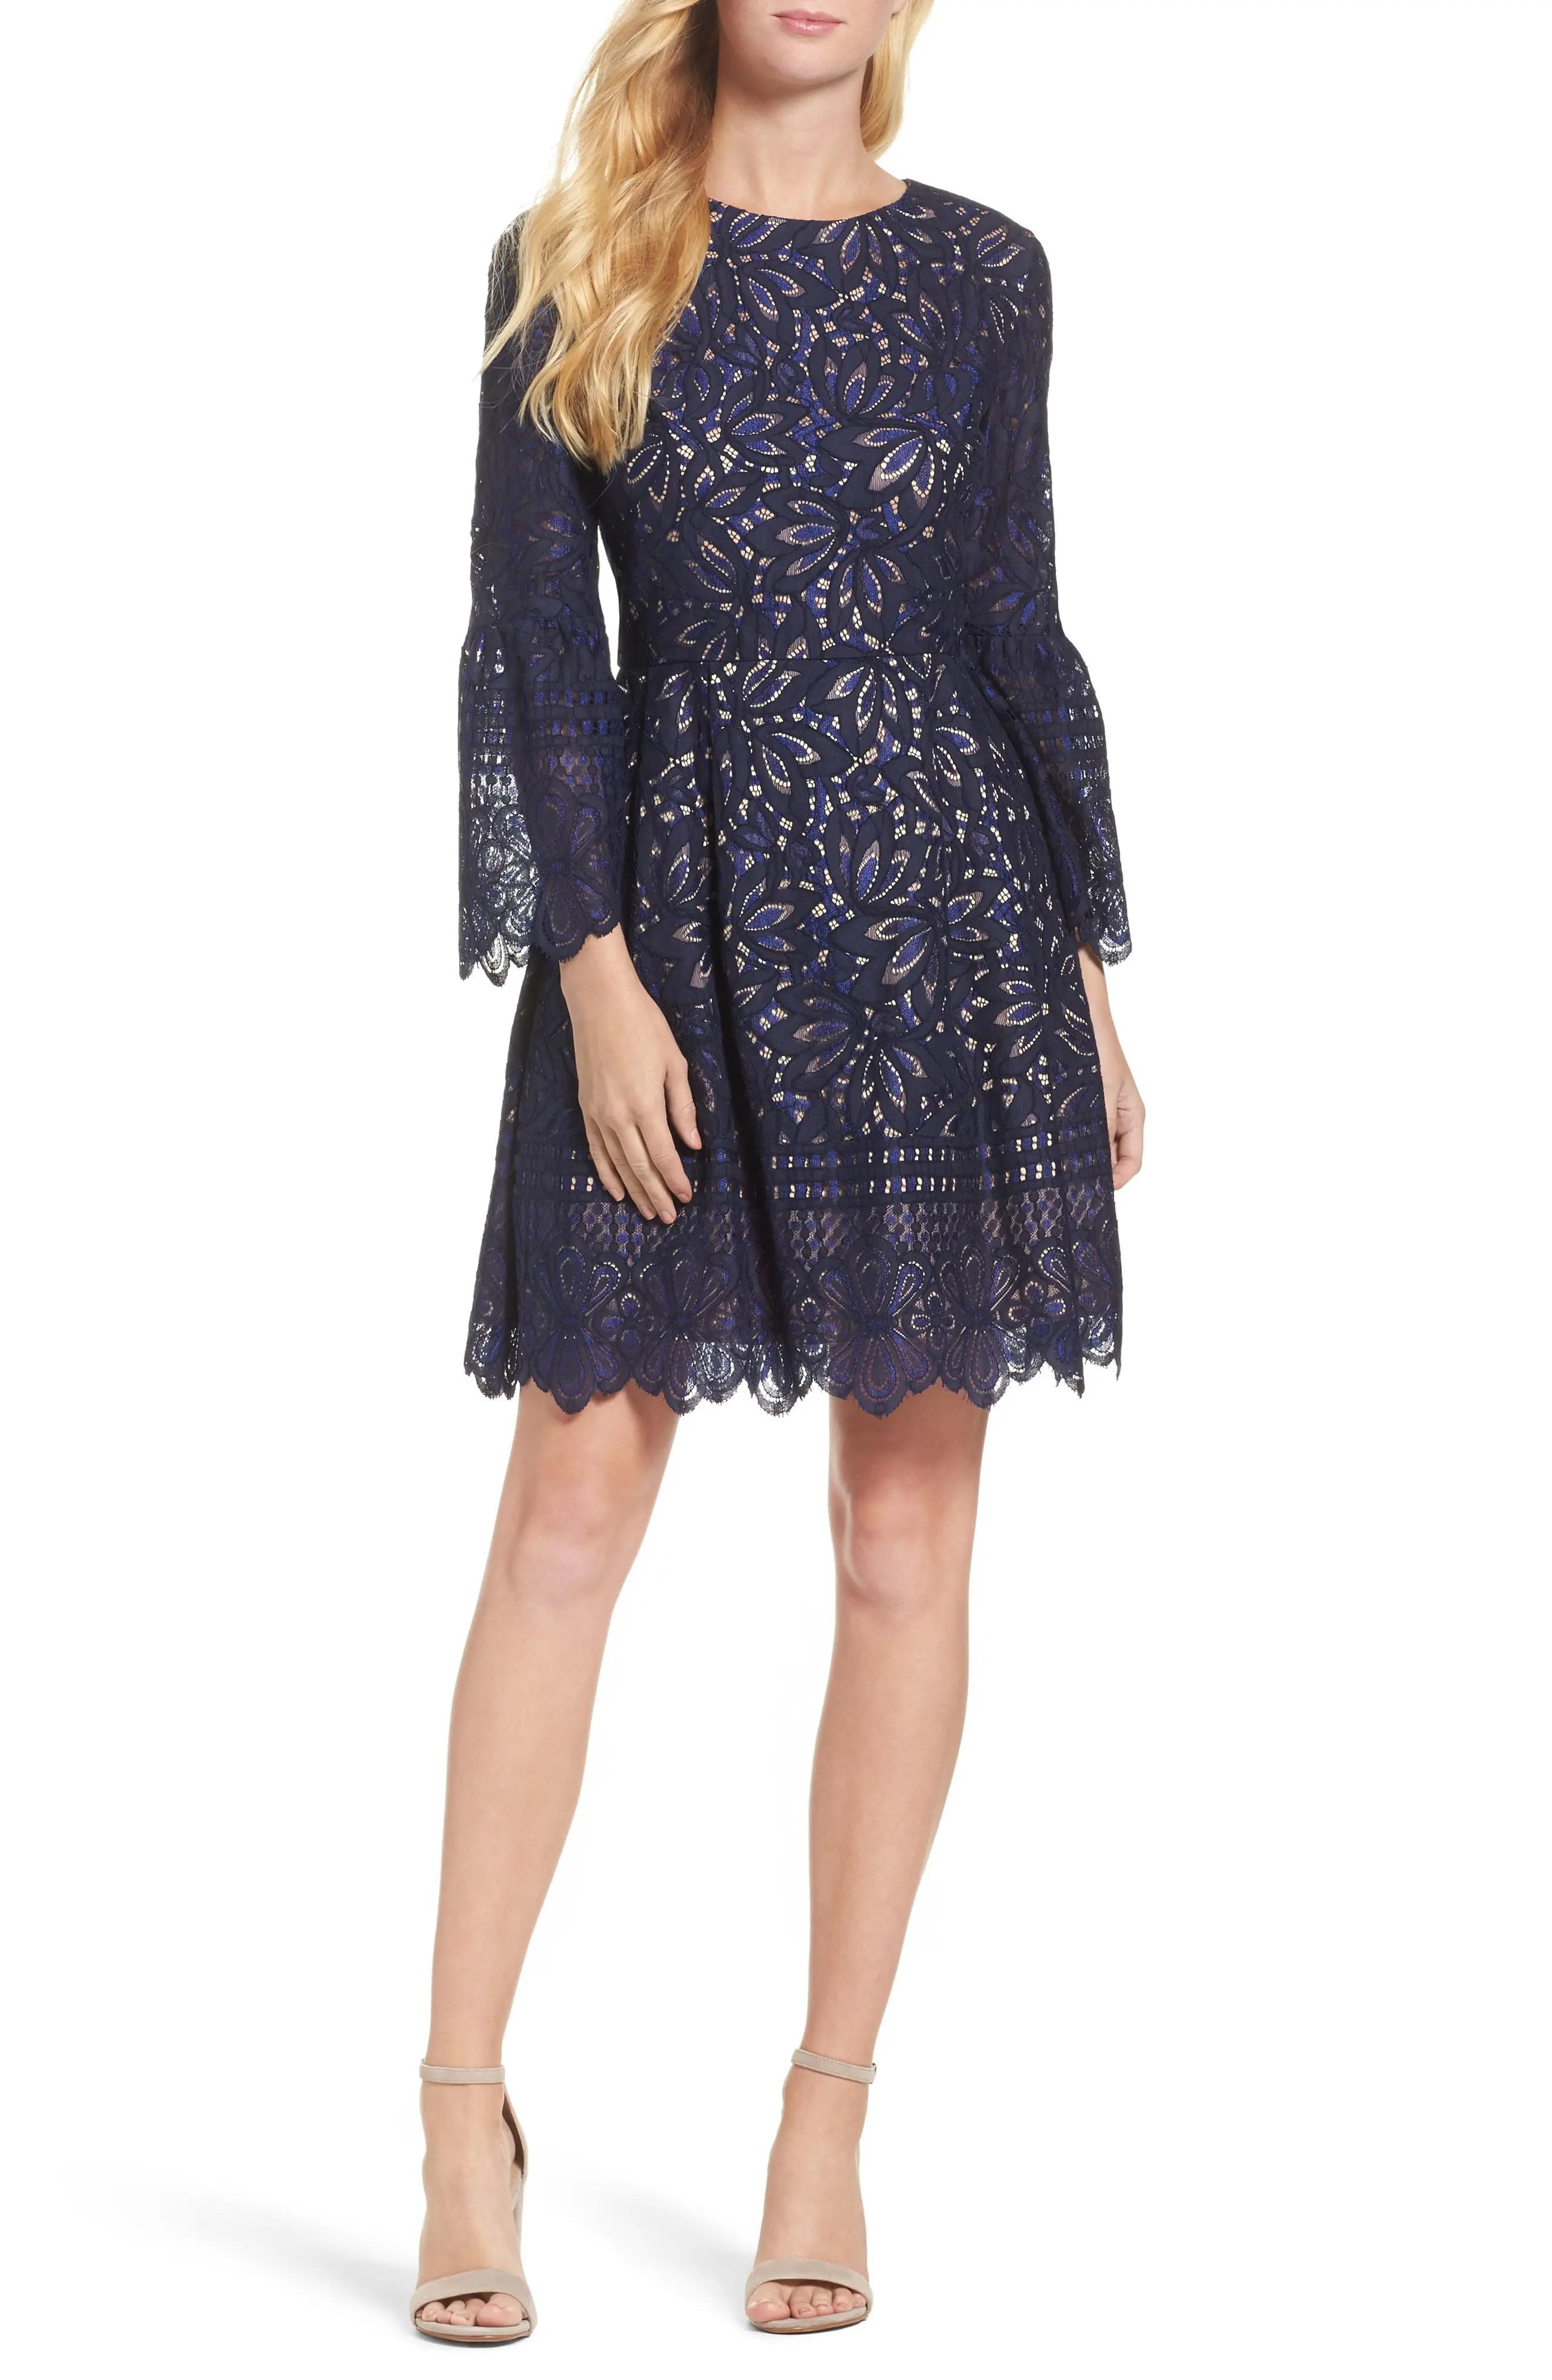 Eliza  lace bell sleeve fit  flare dress regular petite also women  dresses nordstrom rh shoprdstrom